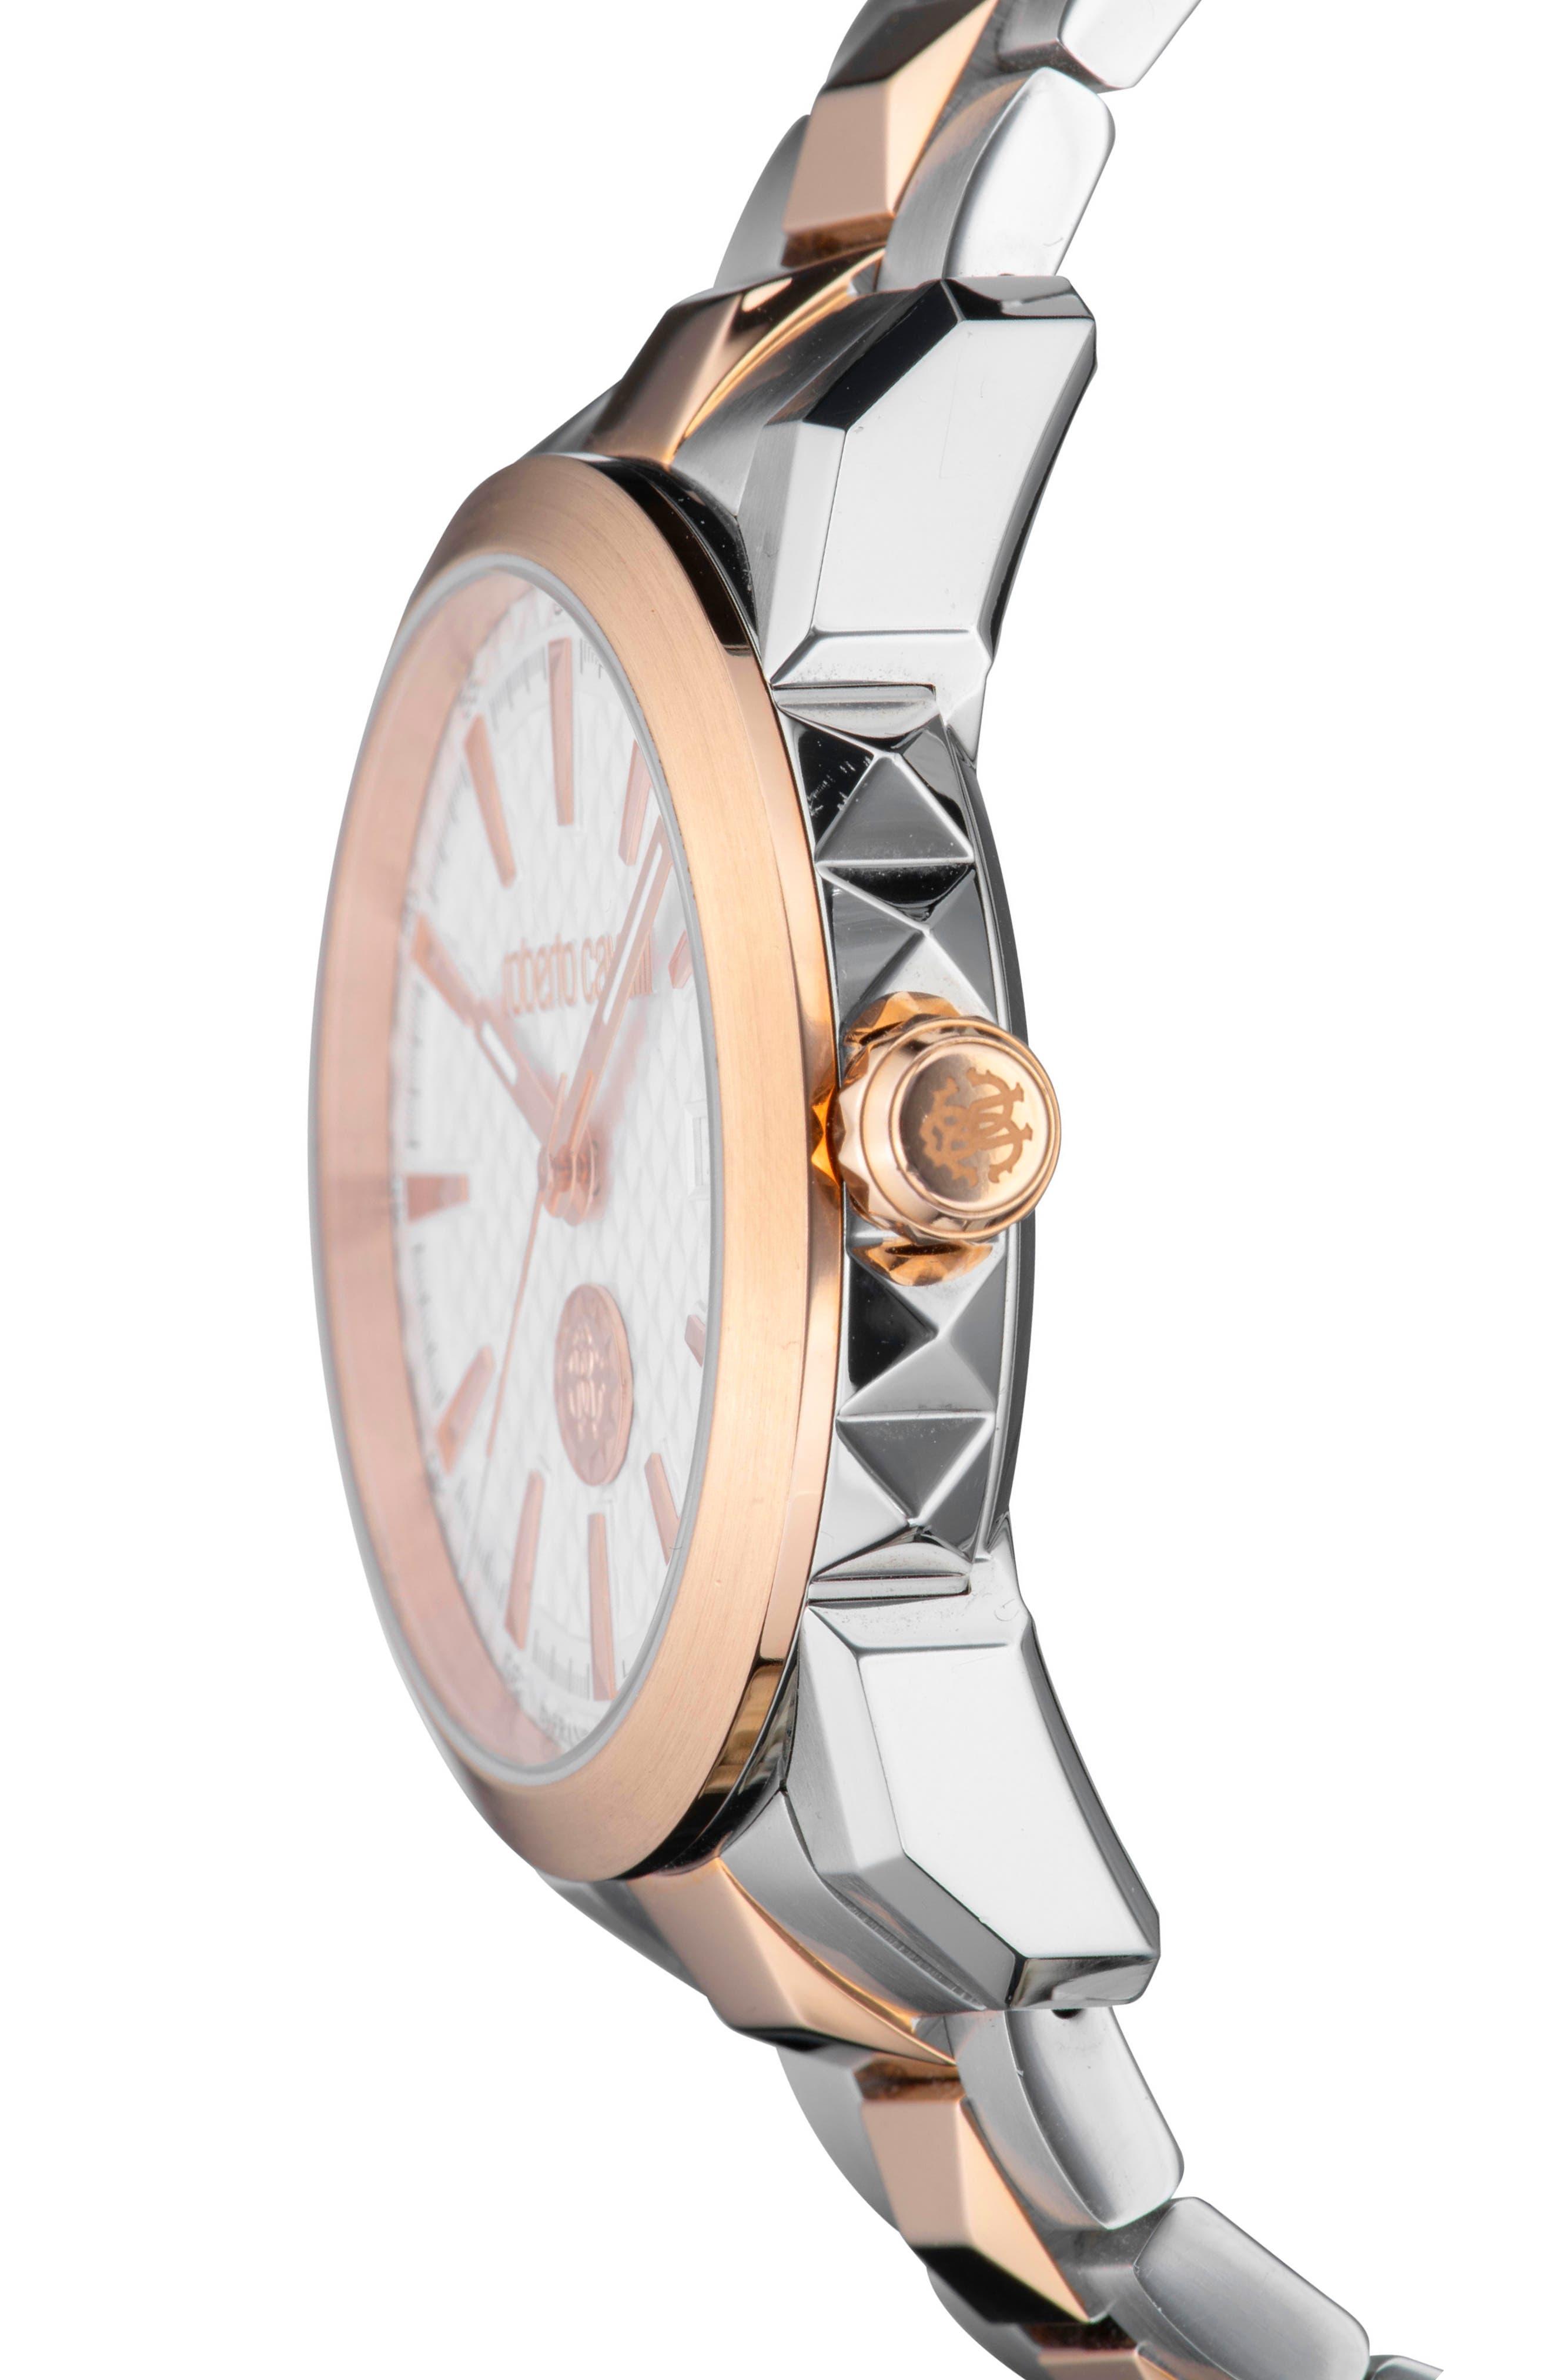 Costellato Bracelet Watch,                             Alternate thumbnail 3, color,                             ROSE GOLD/ SILVER